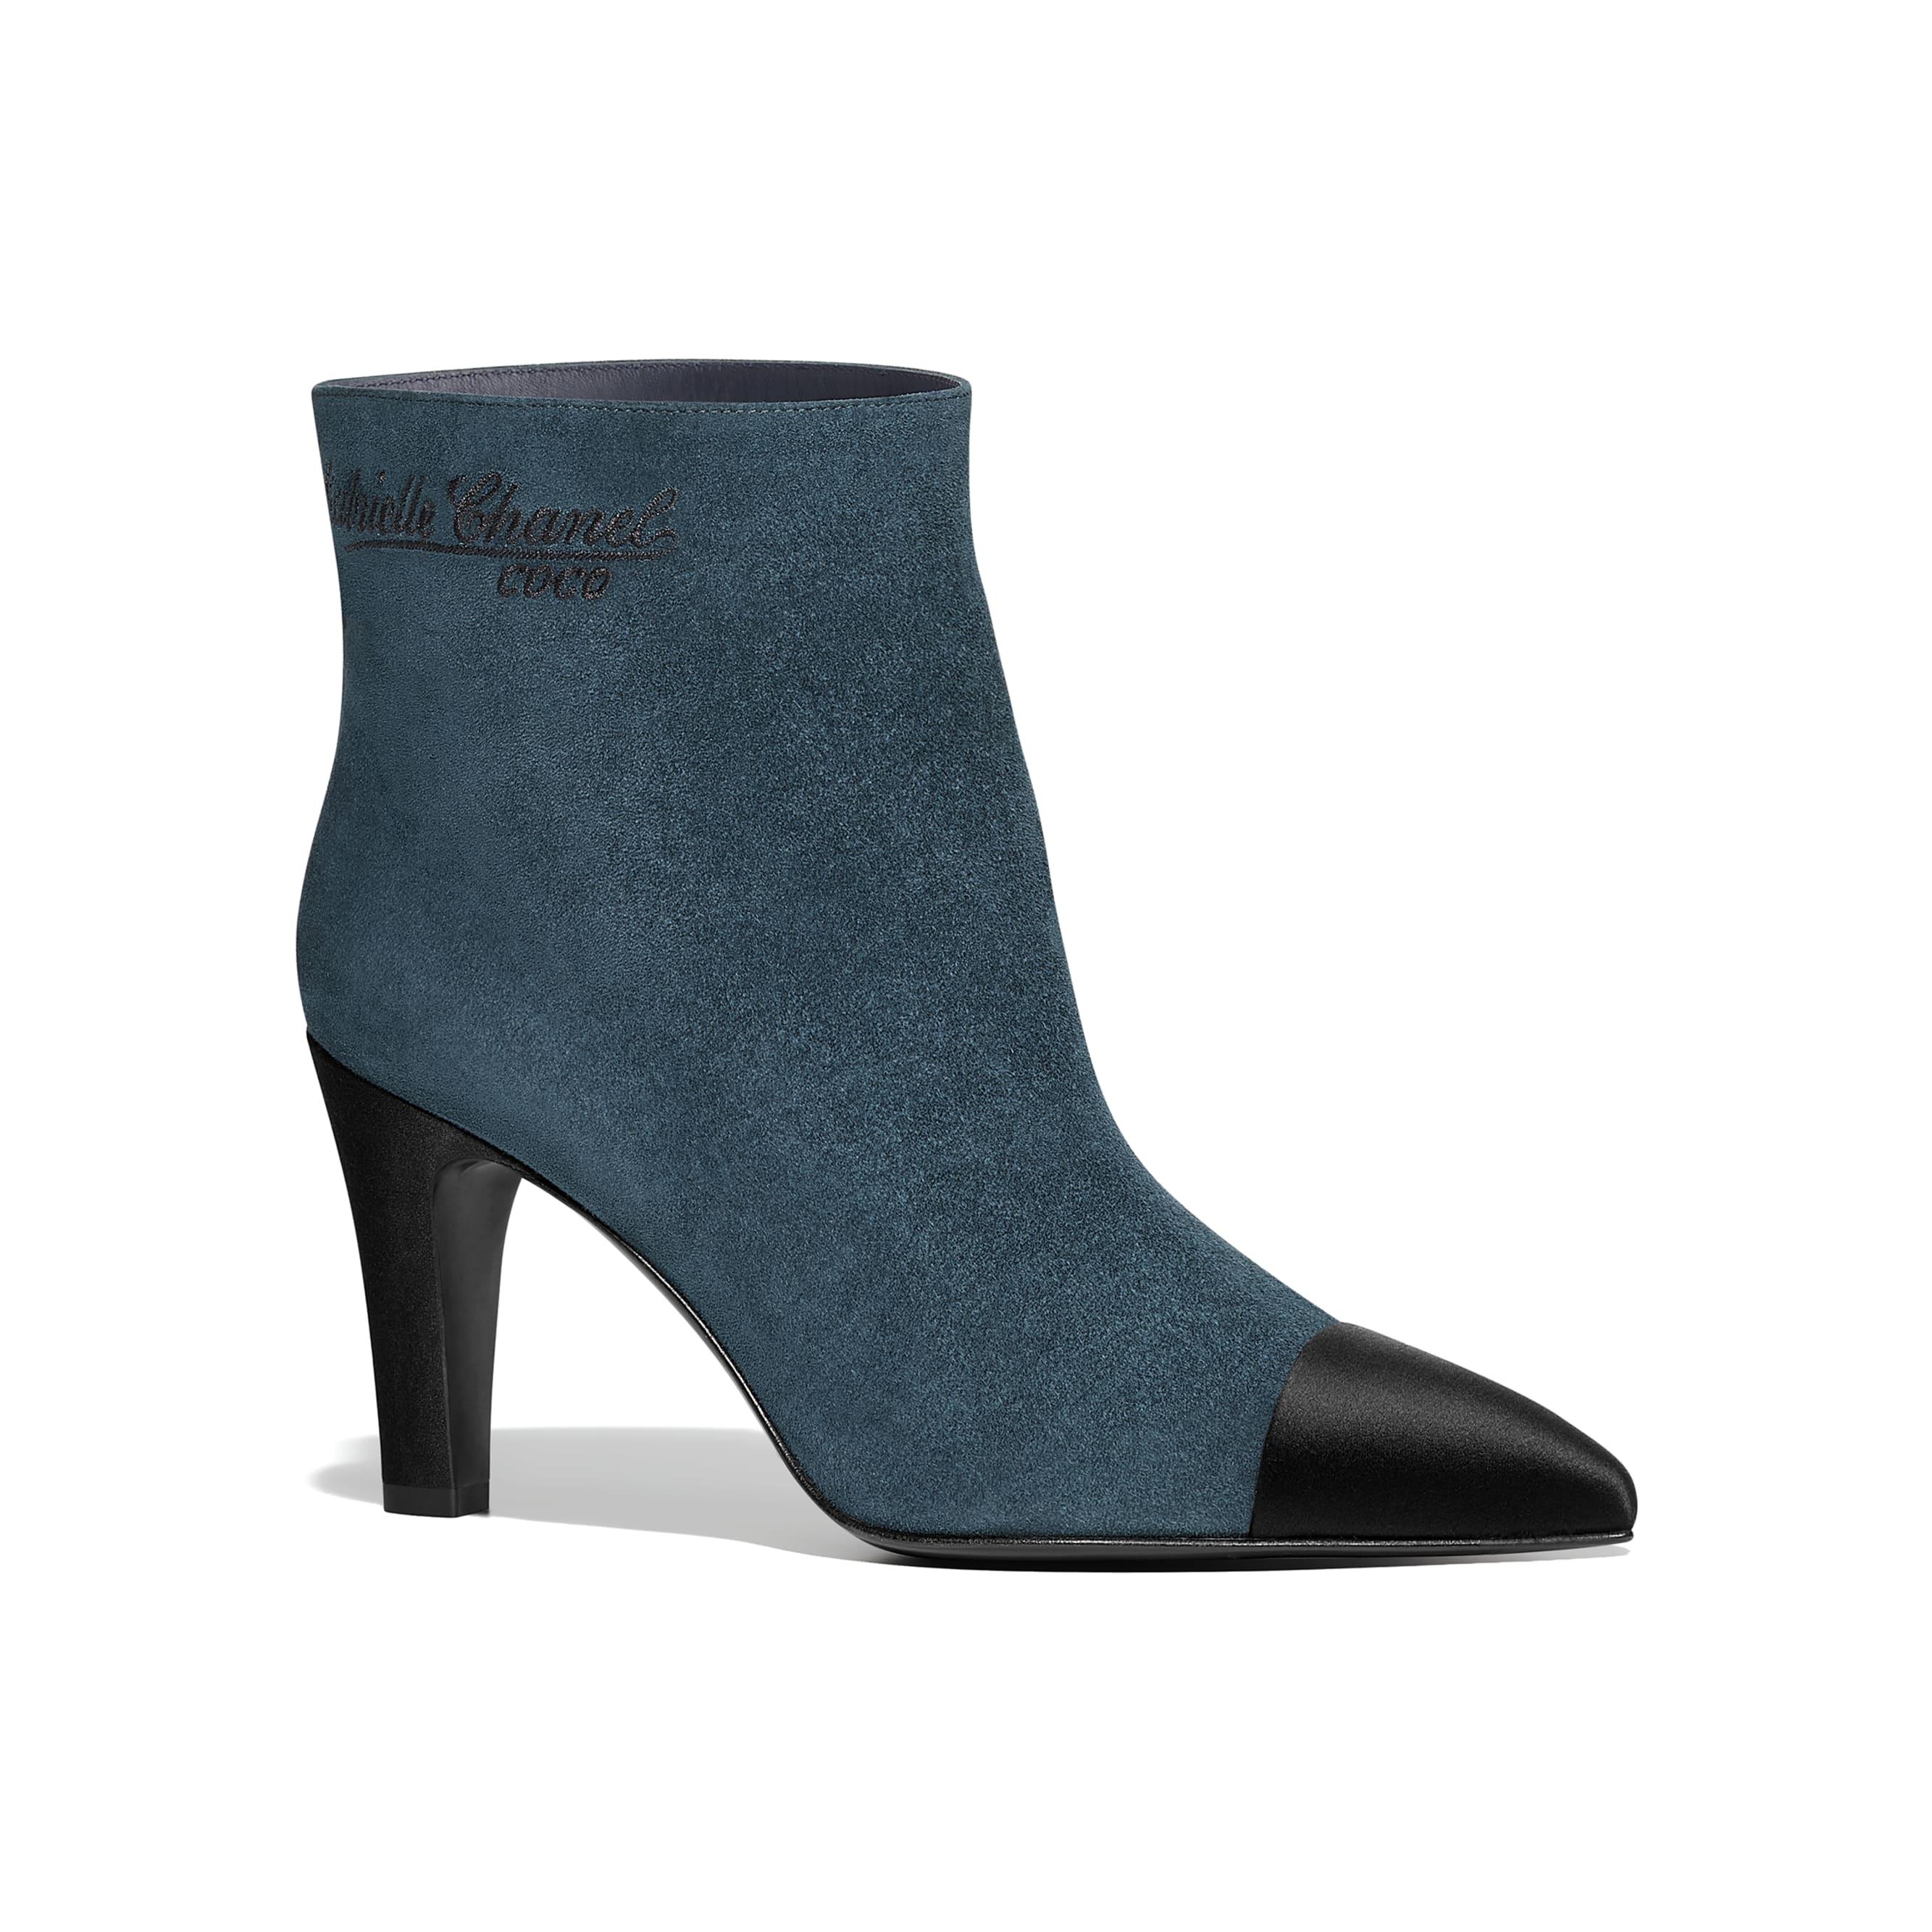 Short Boots - Blue & Black - Suede Calfskin & Satin - Default view - see standard sized version